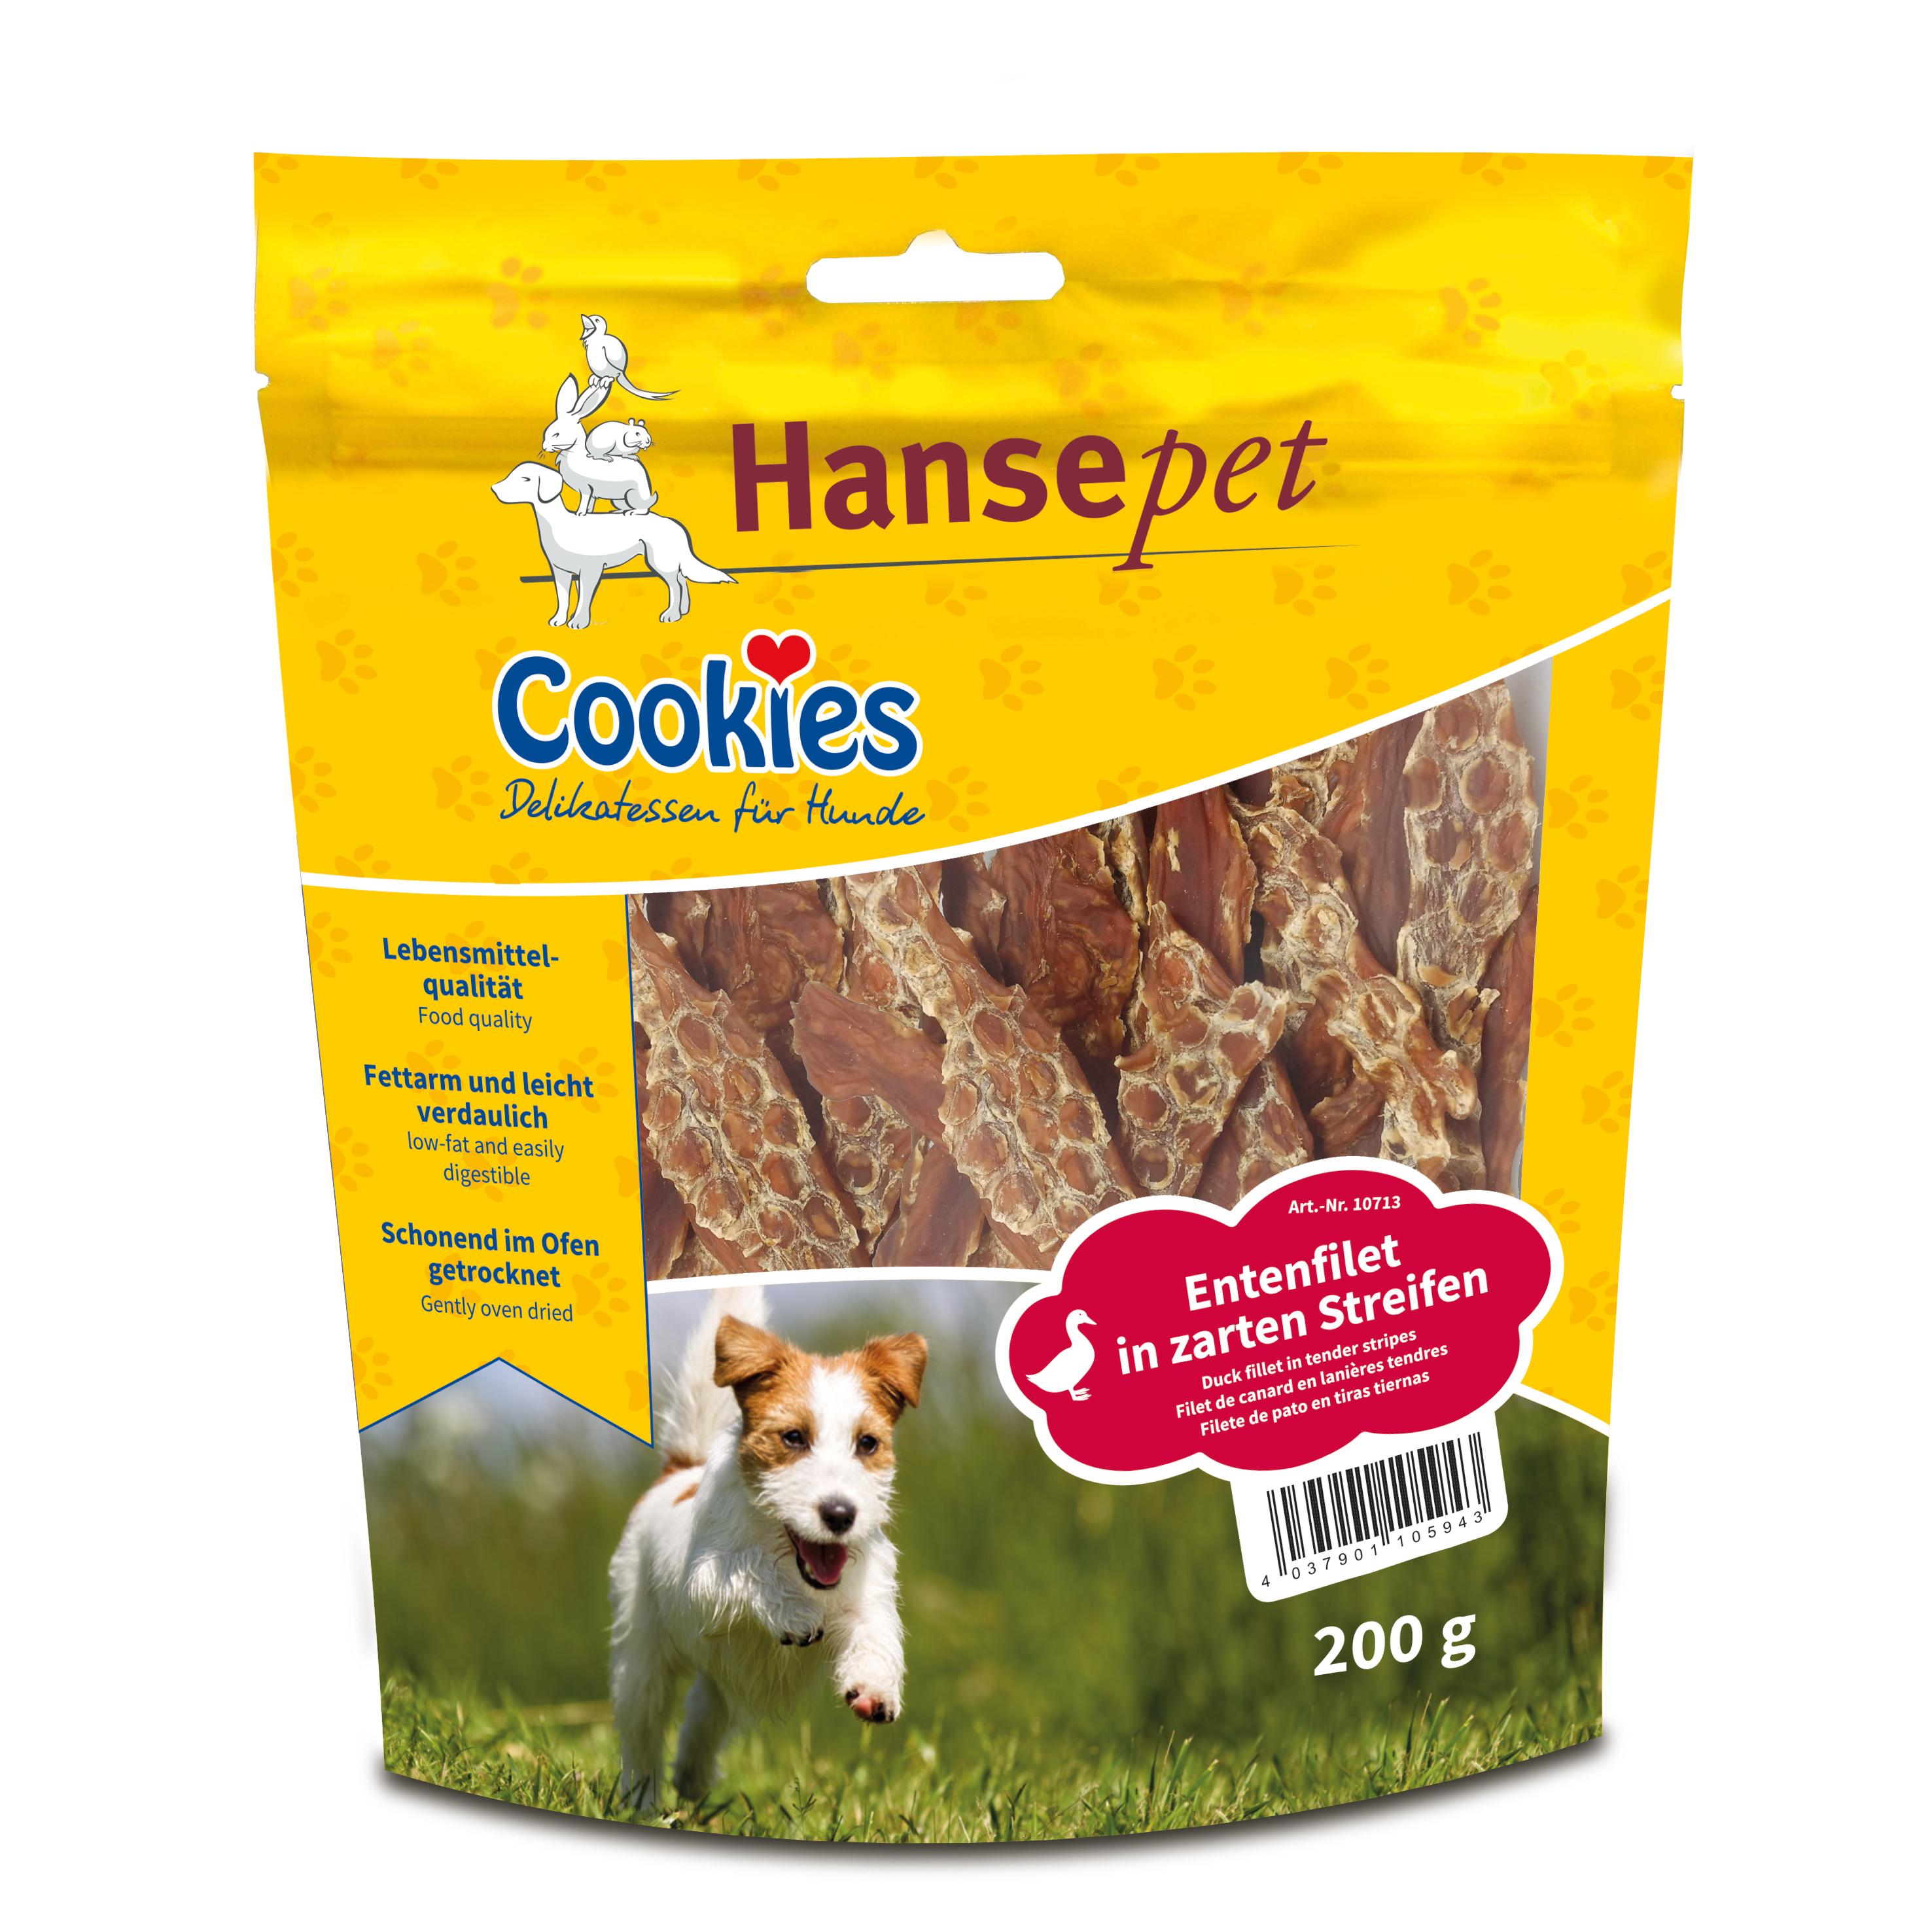 Entenfiletstreifen, Cookies Hansepet